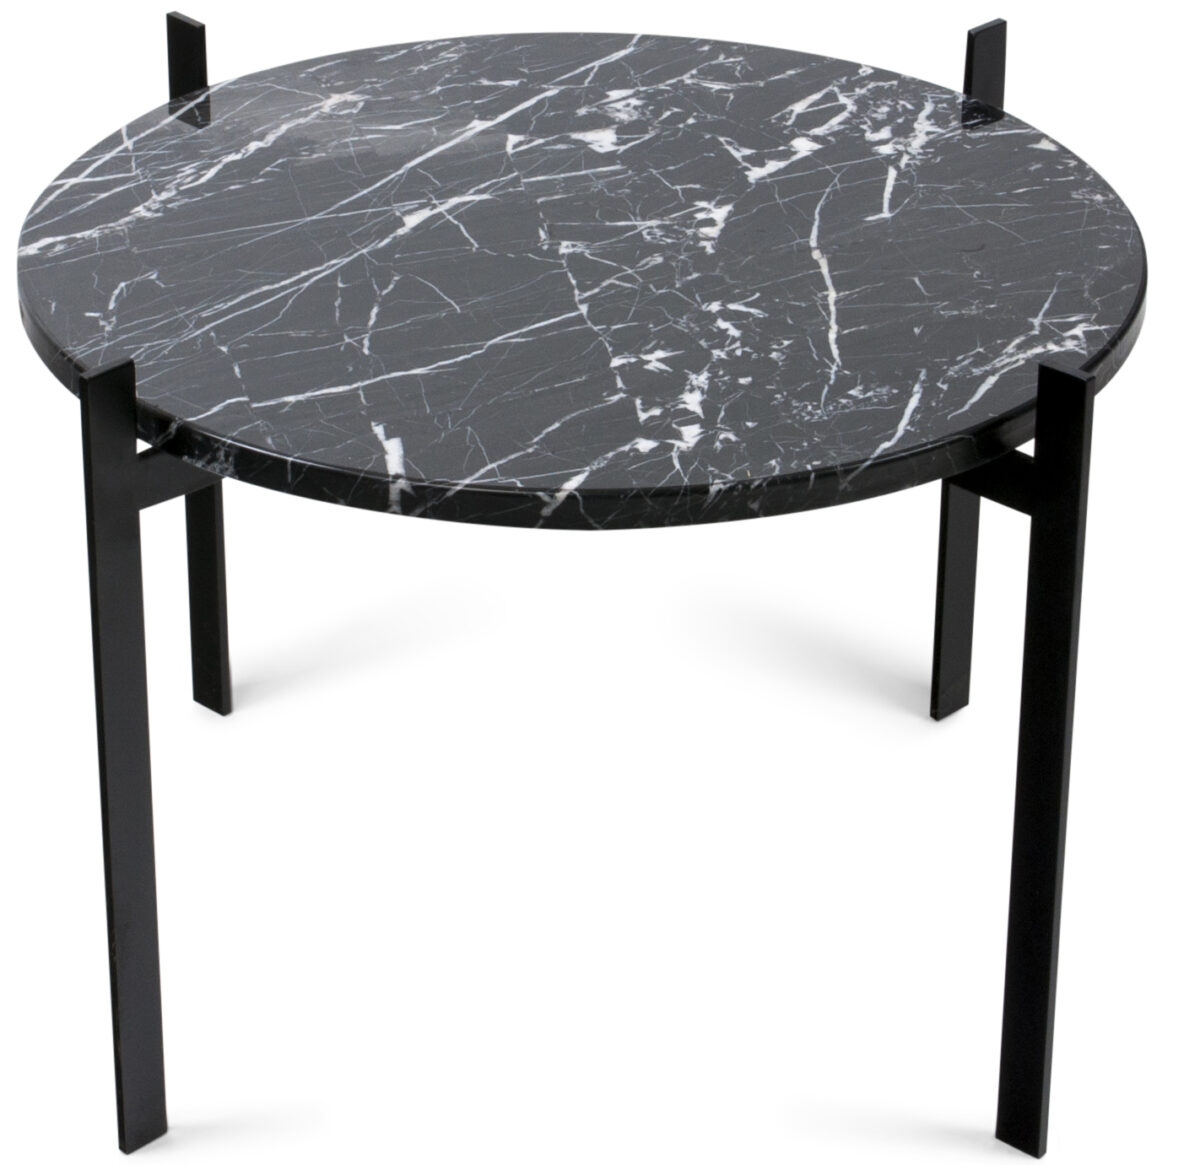 Single Deck Table black frame black marble